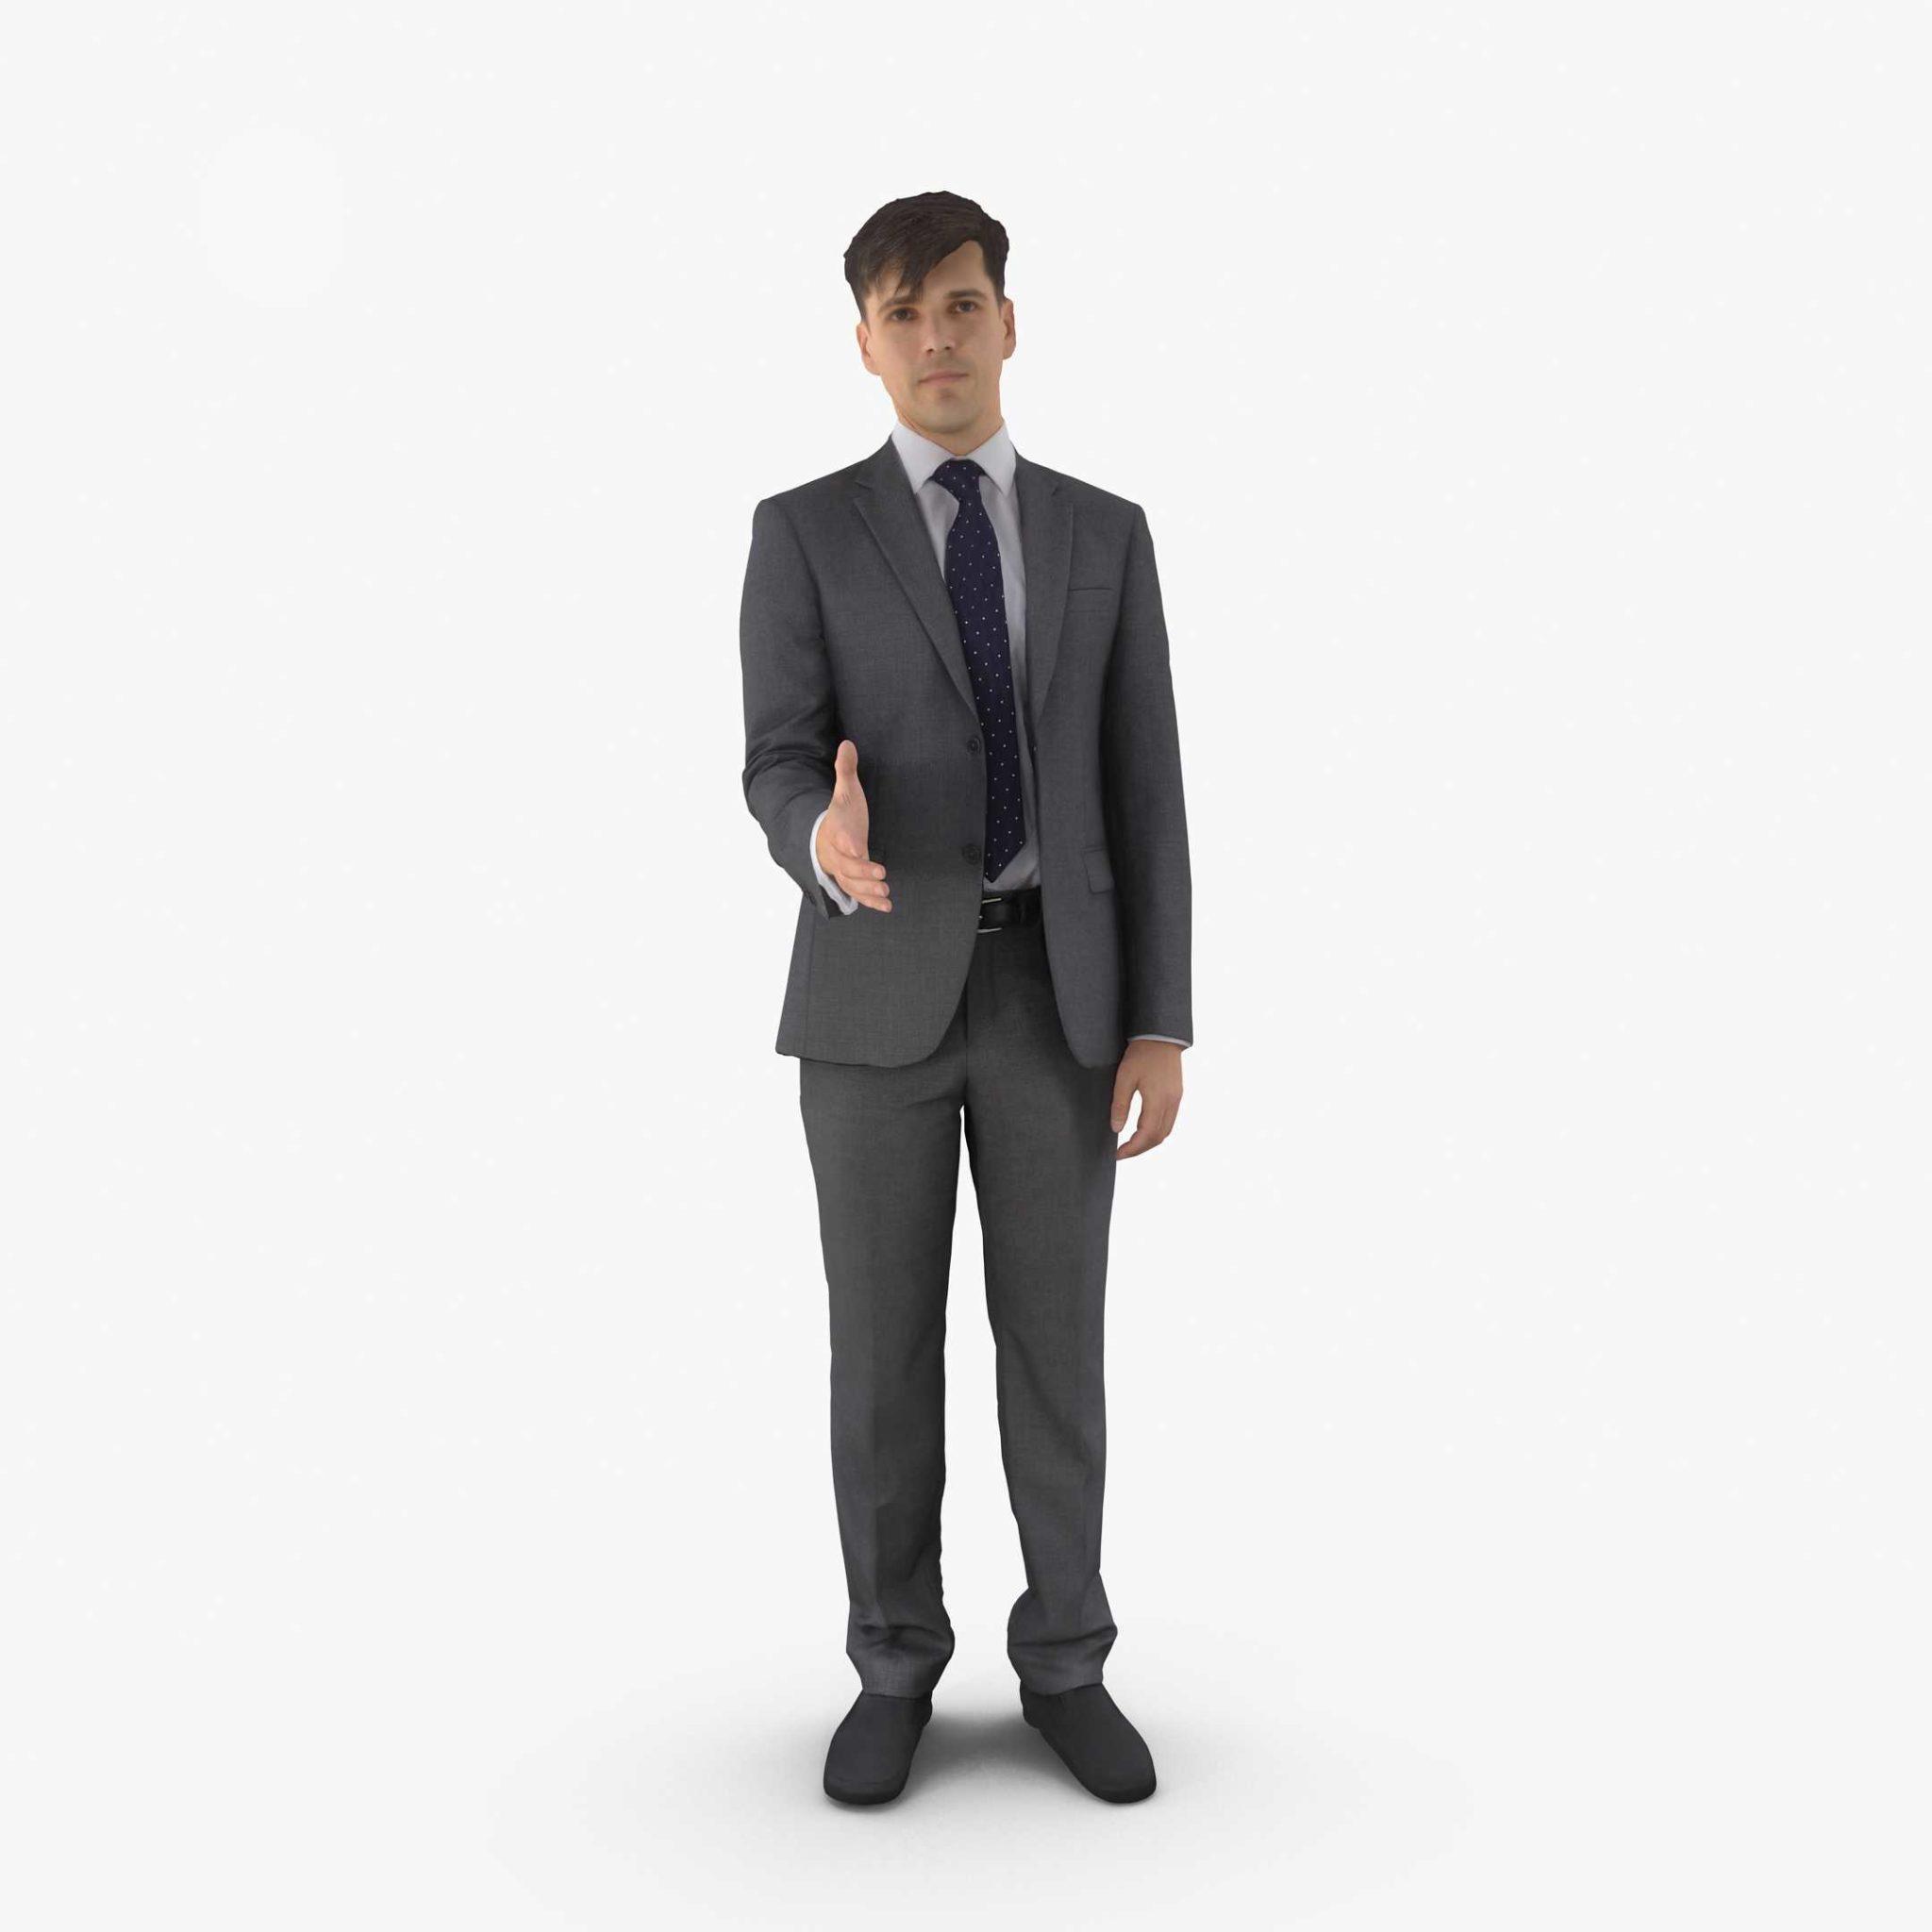 Businessman Greeting 3D Model | 3DTree Scanning Studio